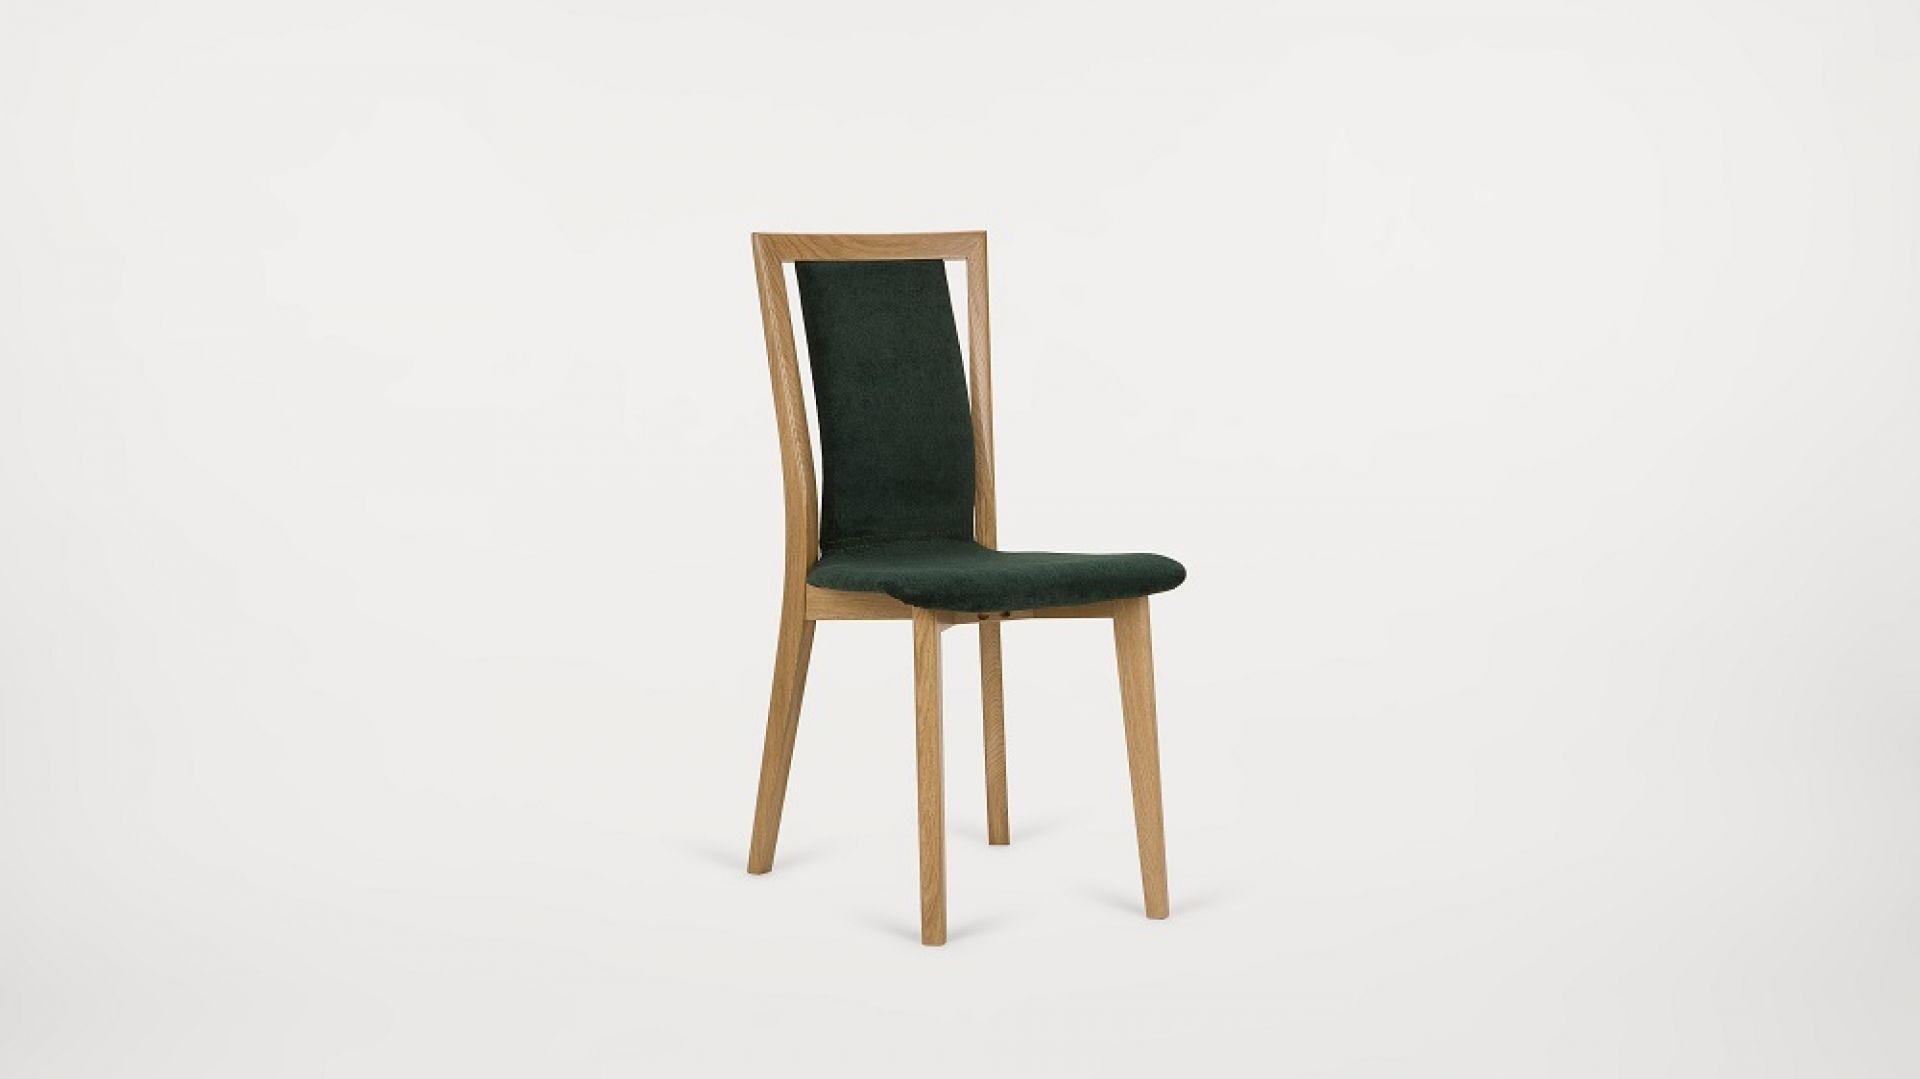 Krzesło Vasco marki Paged Meble_fot. Paged Meble.jpg